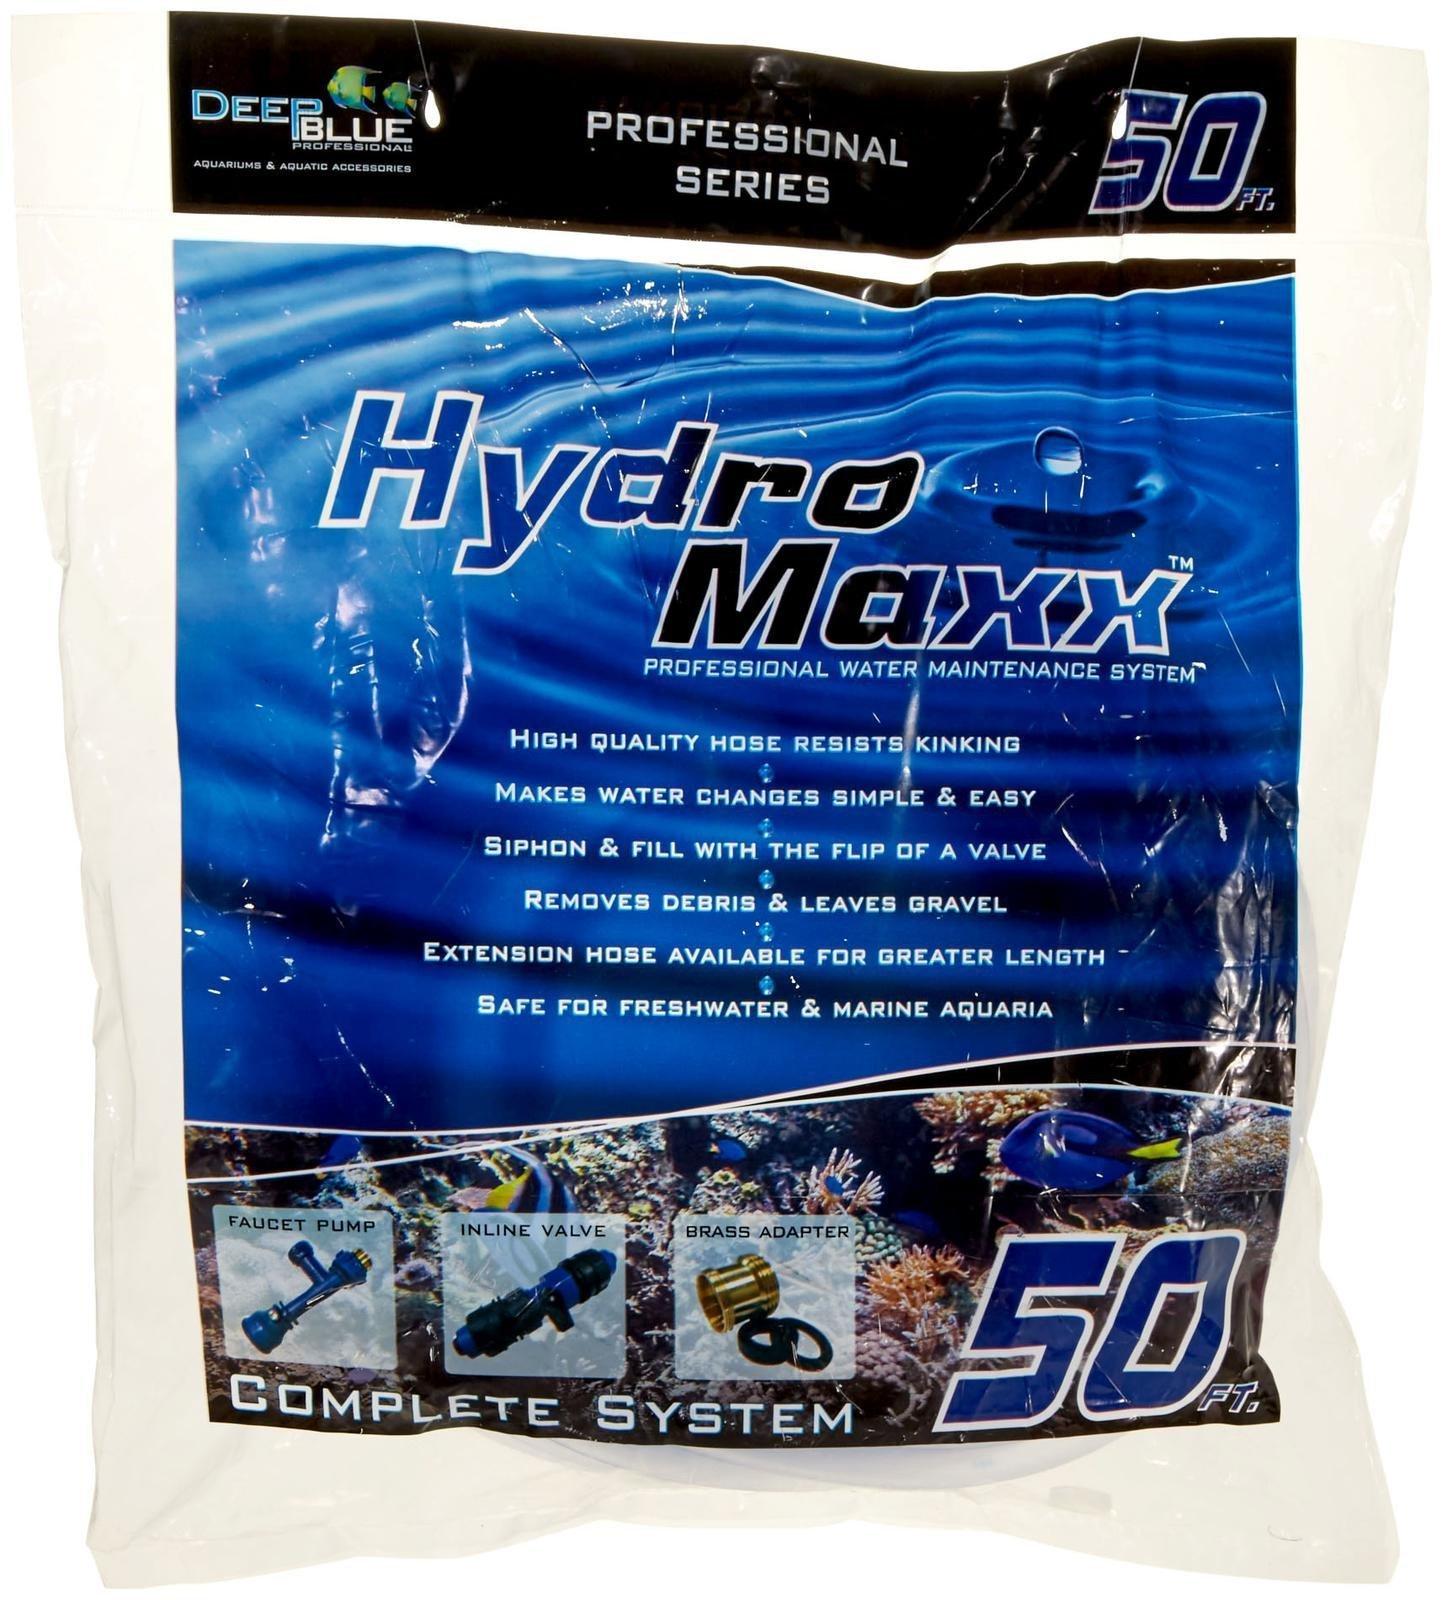 Deep Blue Professional ADB88850 Hydromaxx Water Changer for Aquarium, 50-Feet